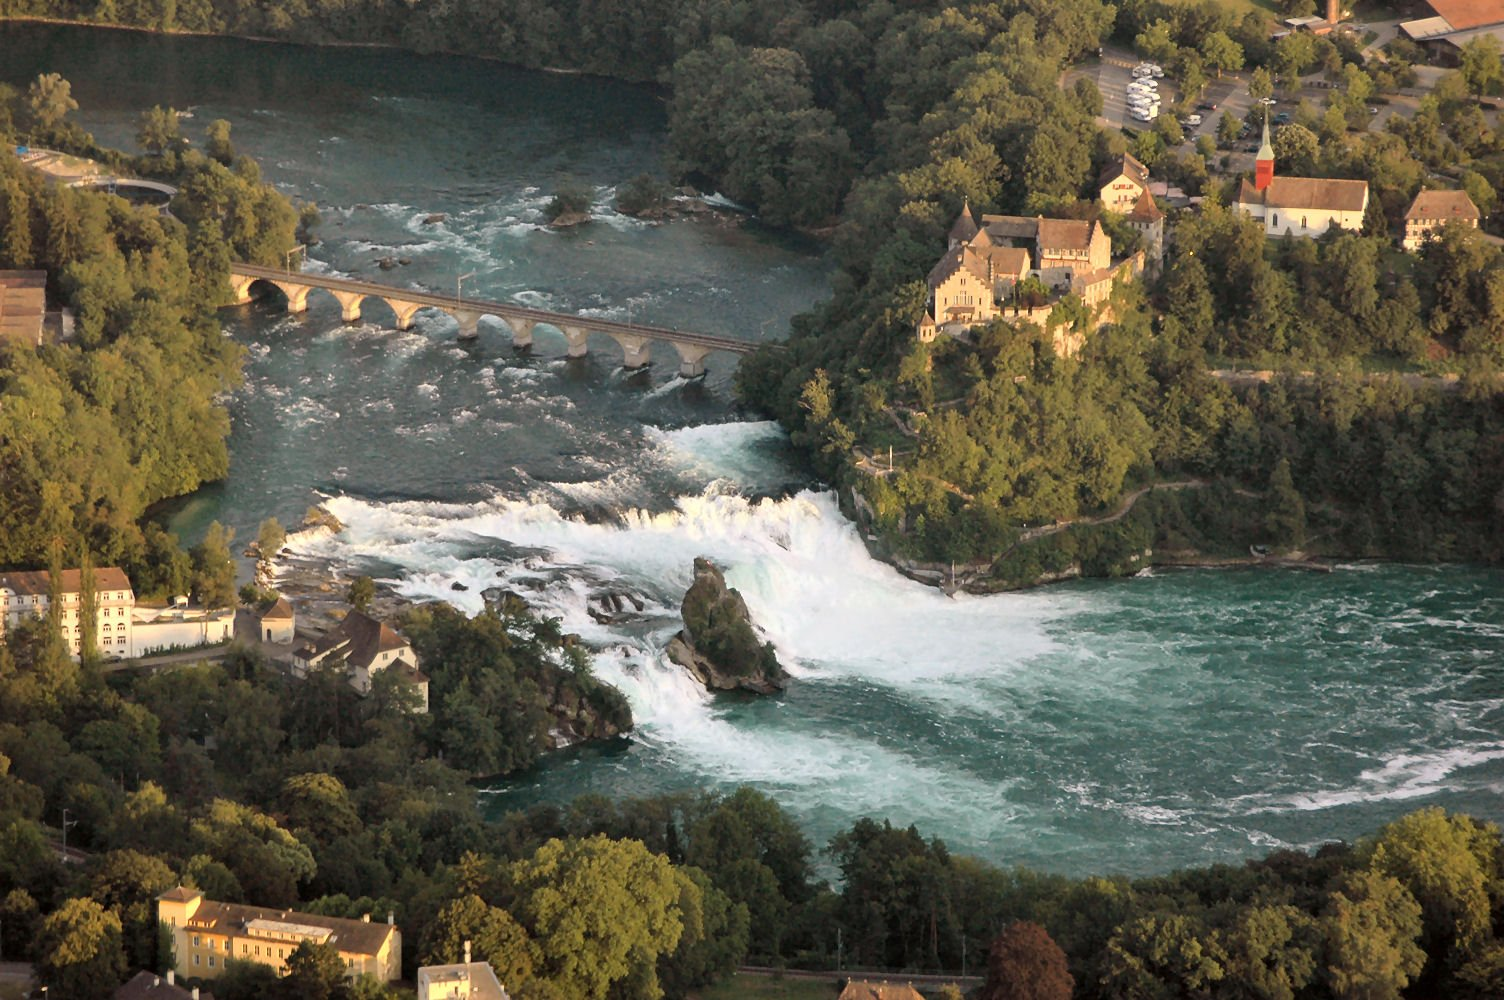 Рейнский водопад (Rheinfall), Швейцария - путеводитель ...